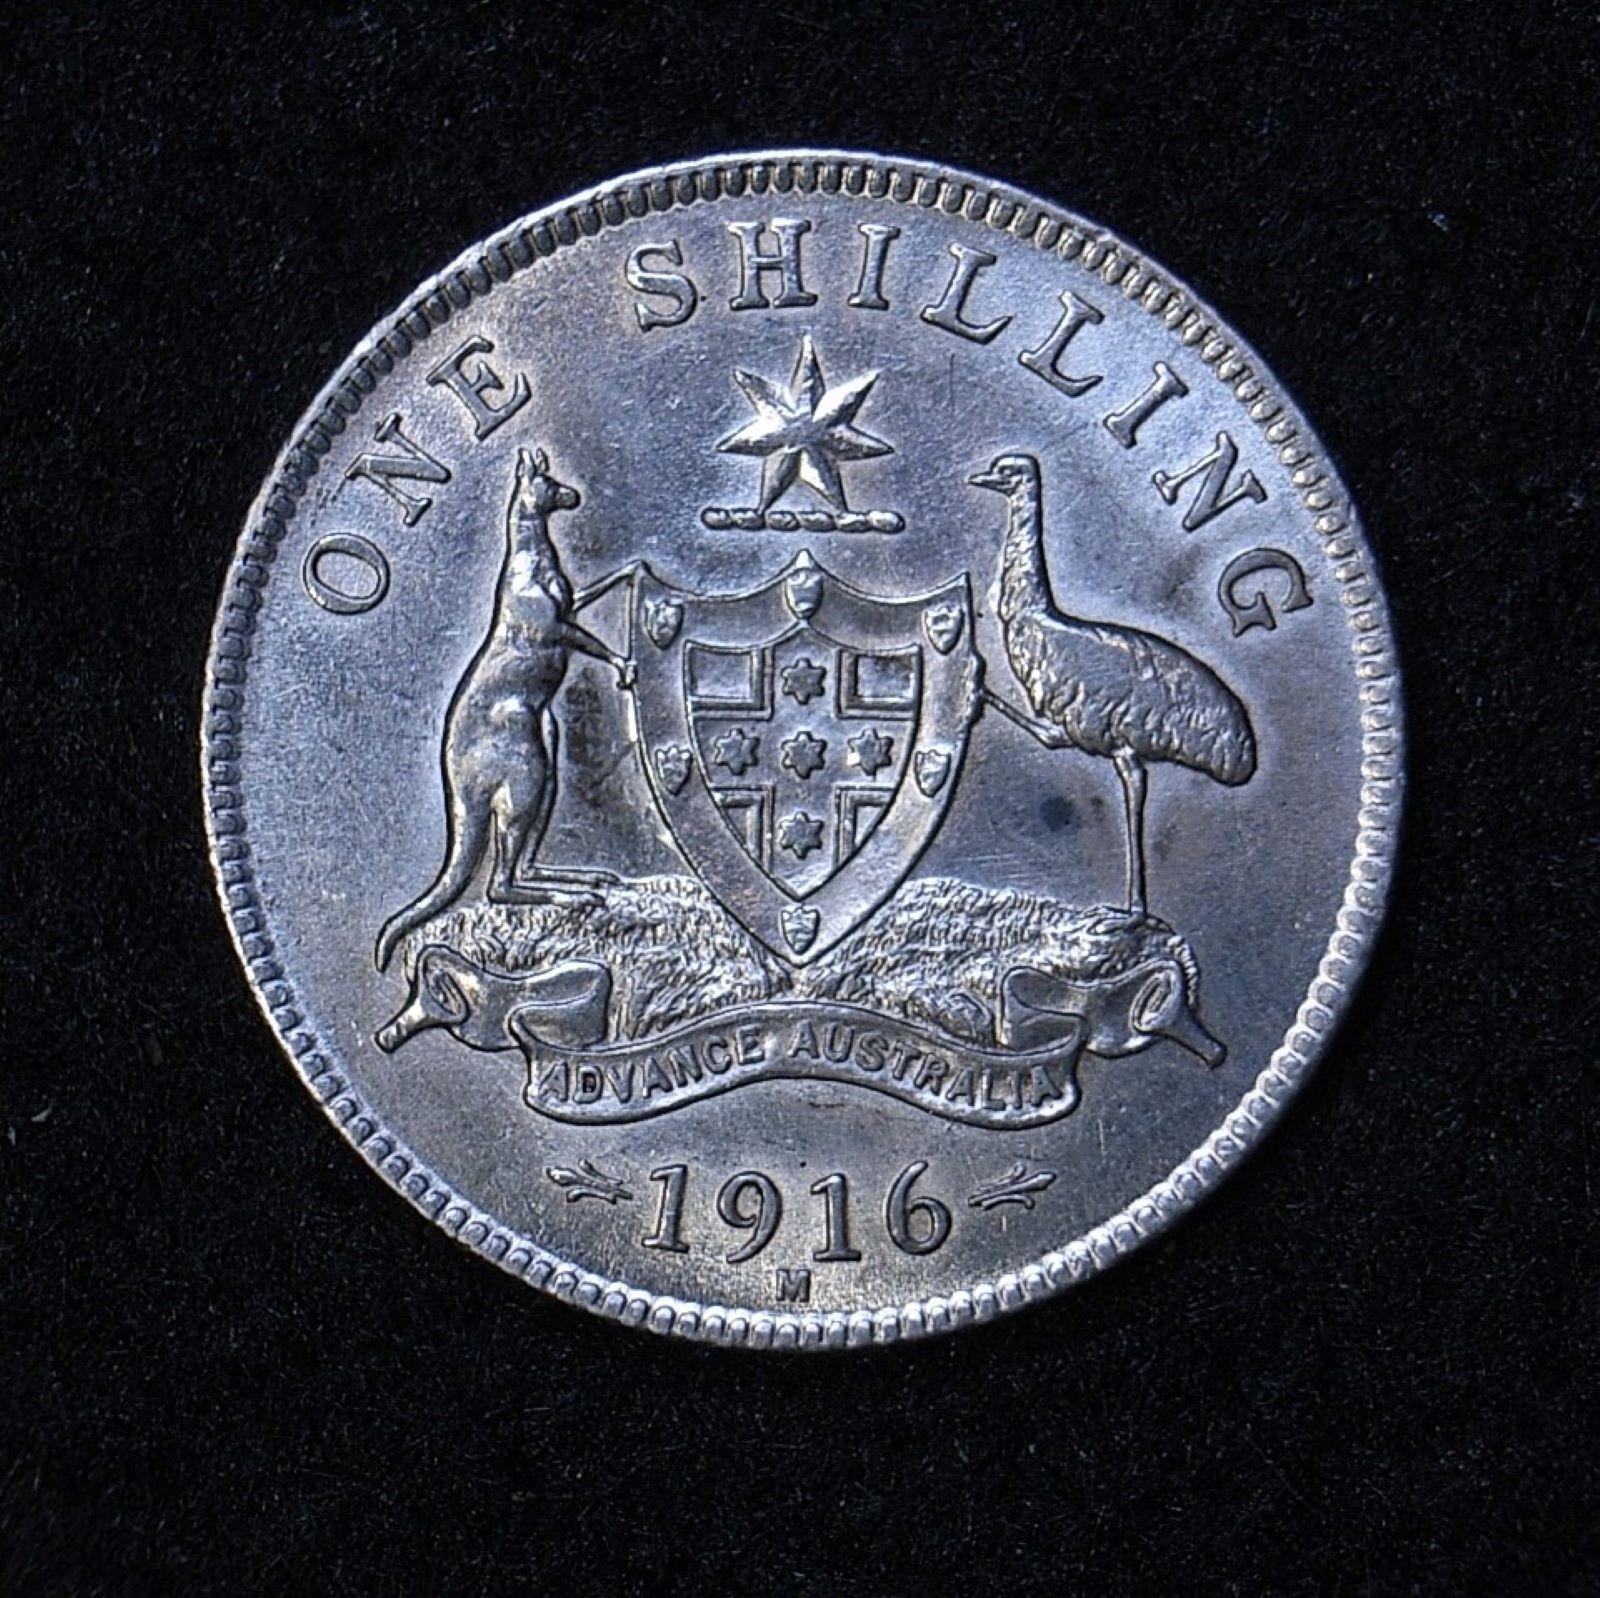 Aus Shilling 1916m rev 1